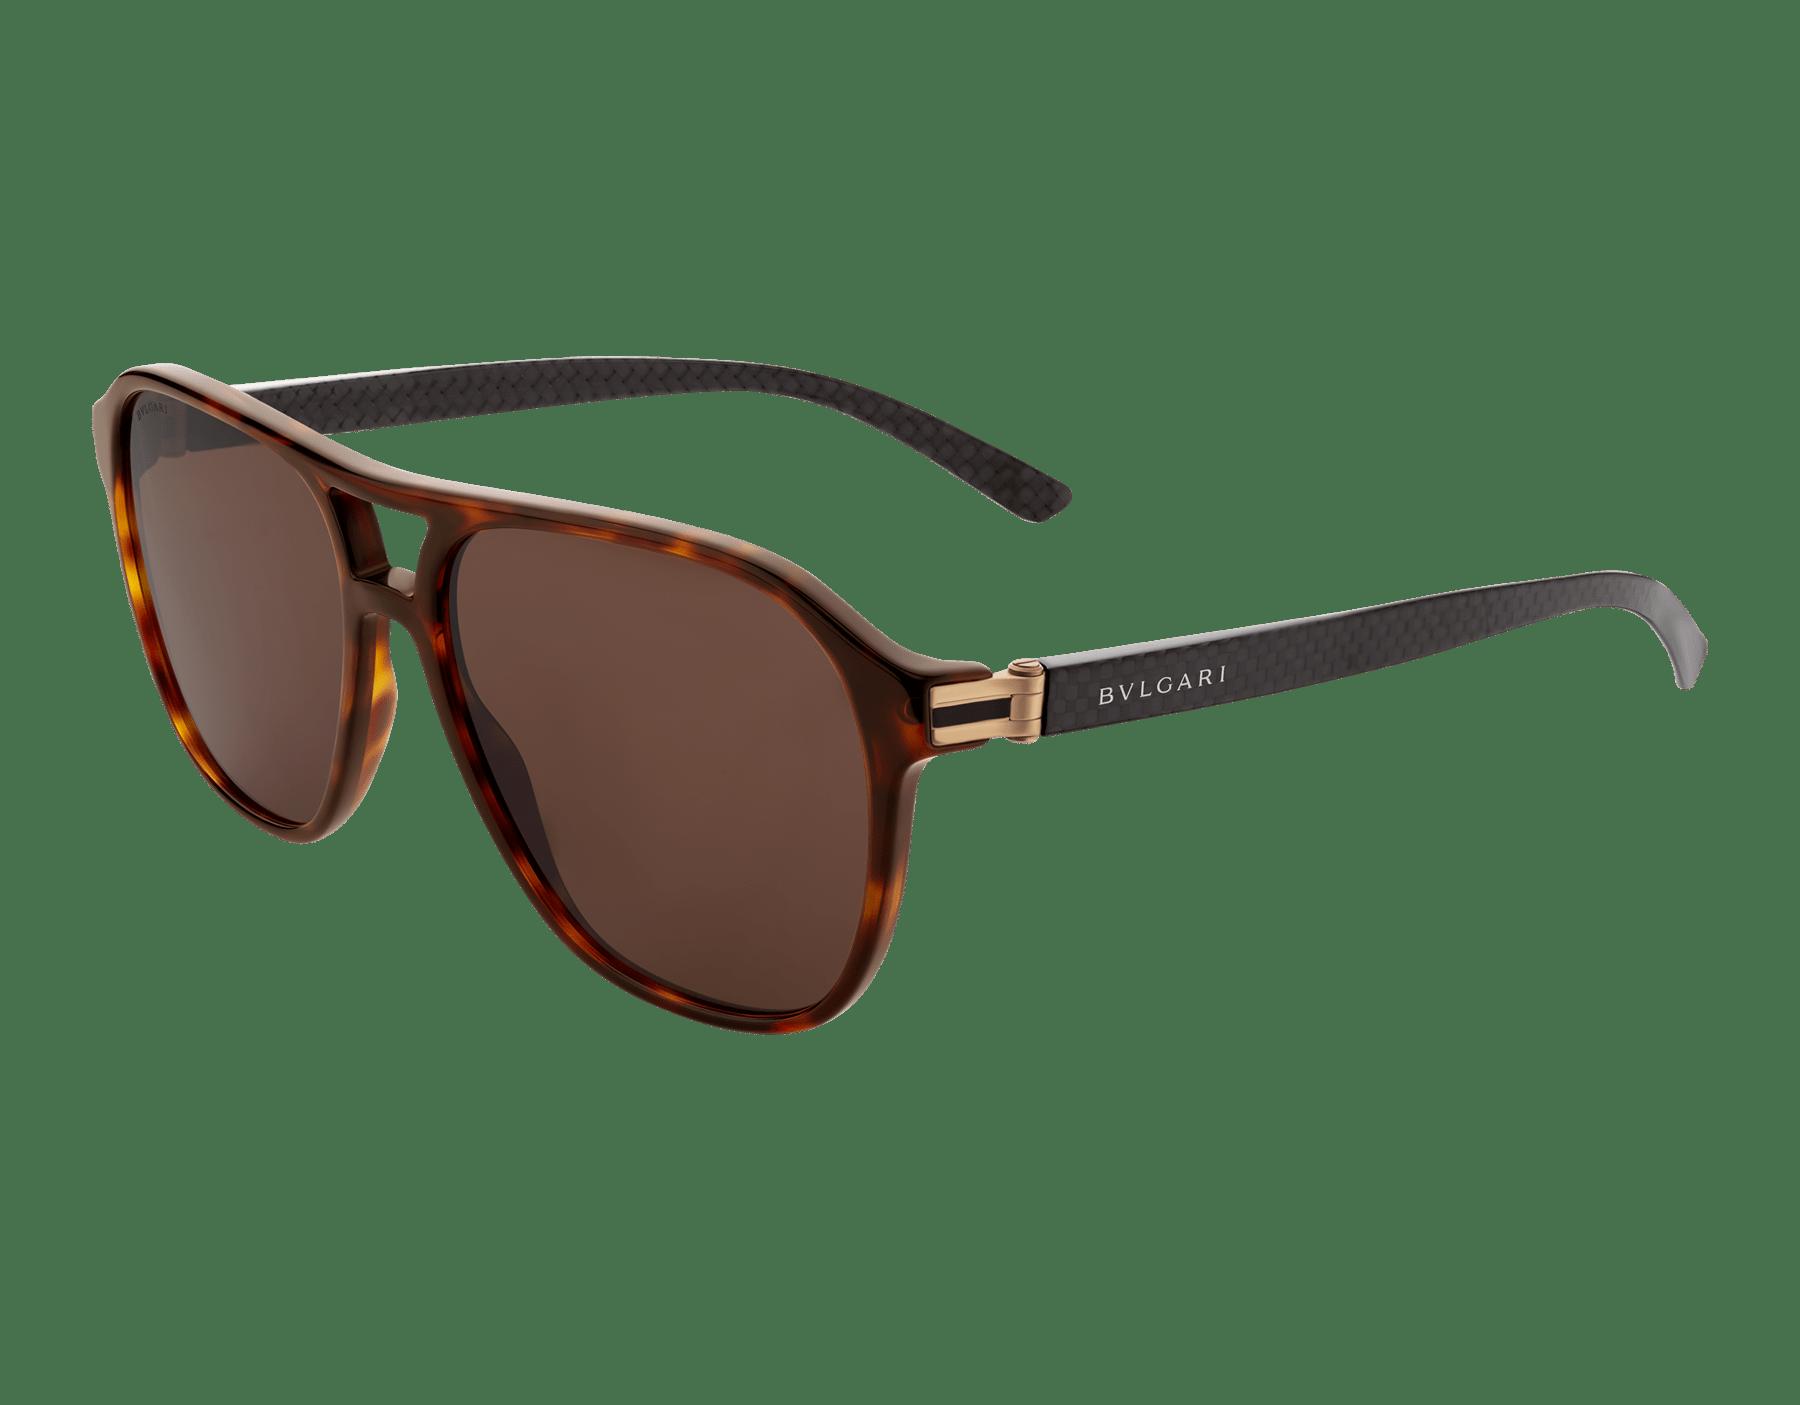 Bvlgari Diagono acetate aviator sunglasses. 903830 image 1